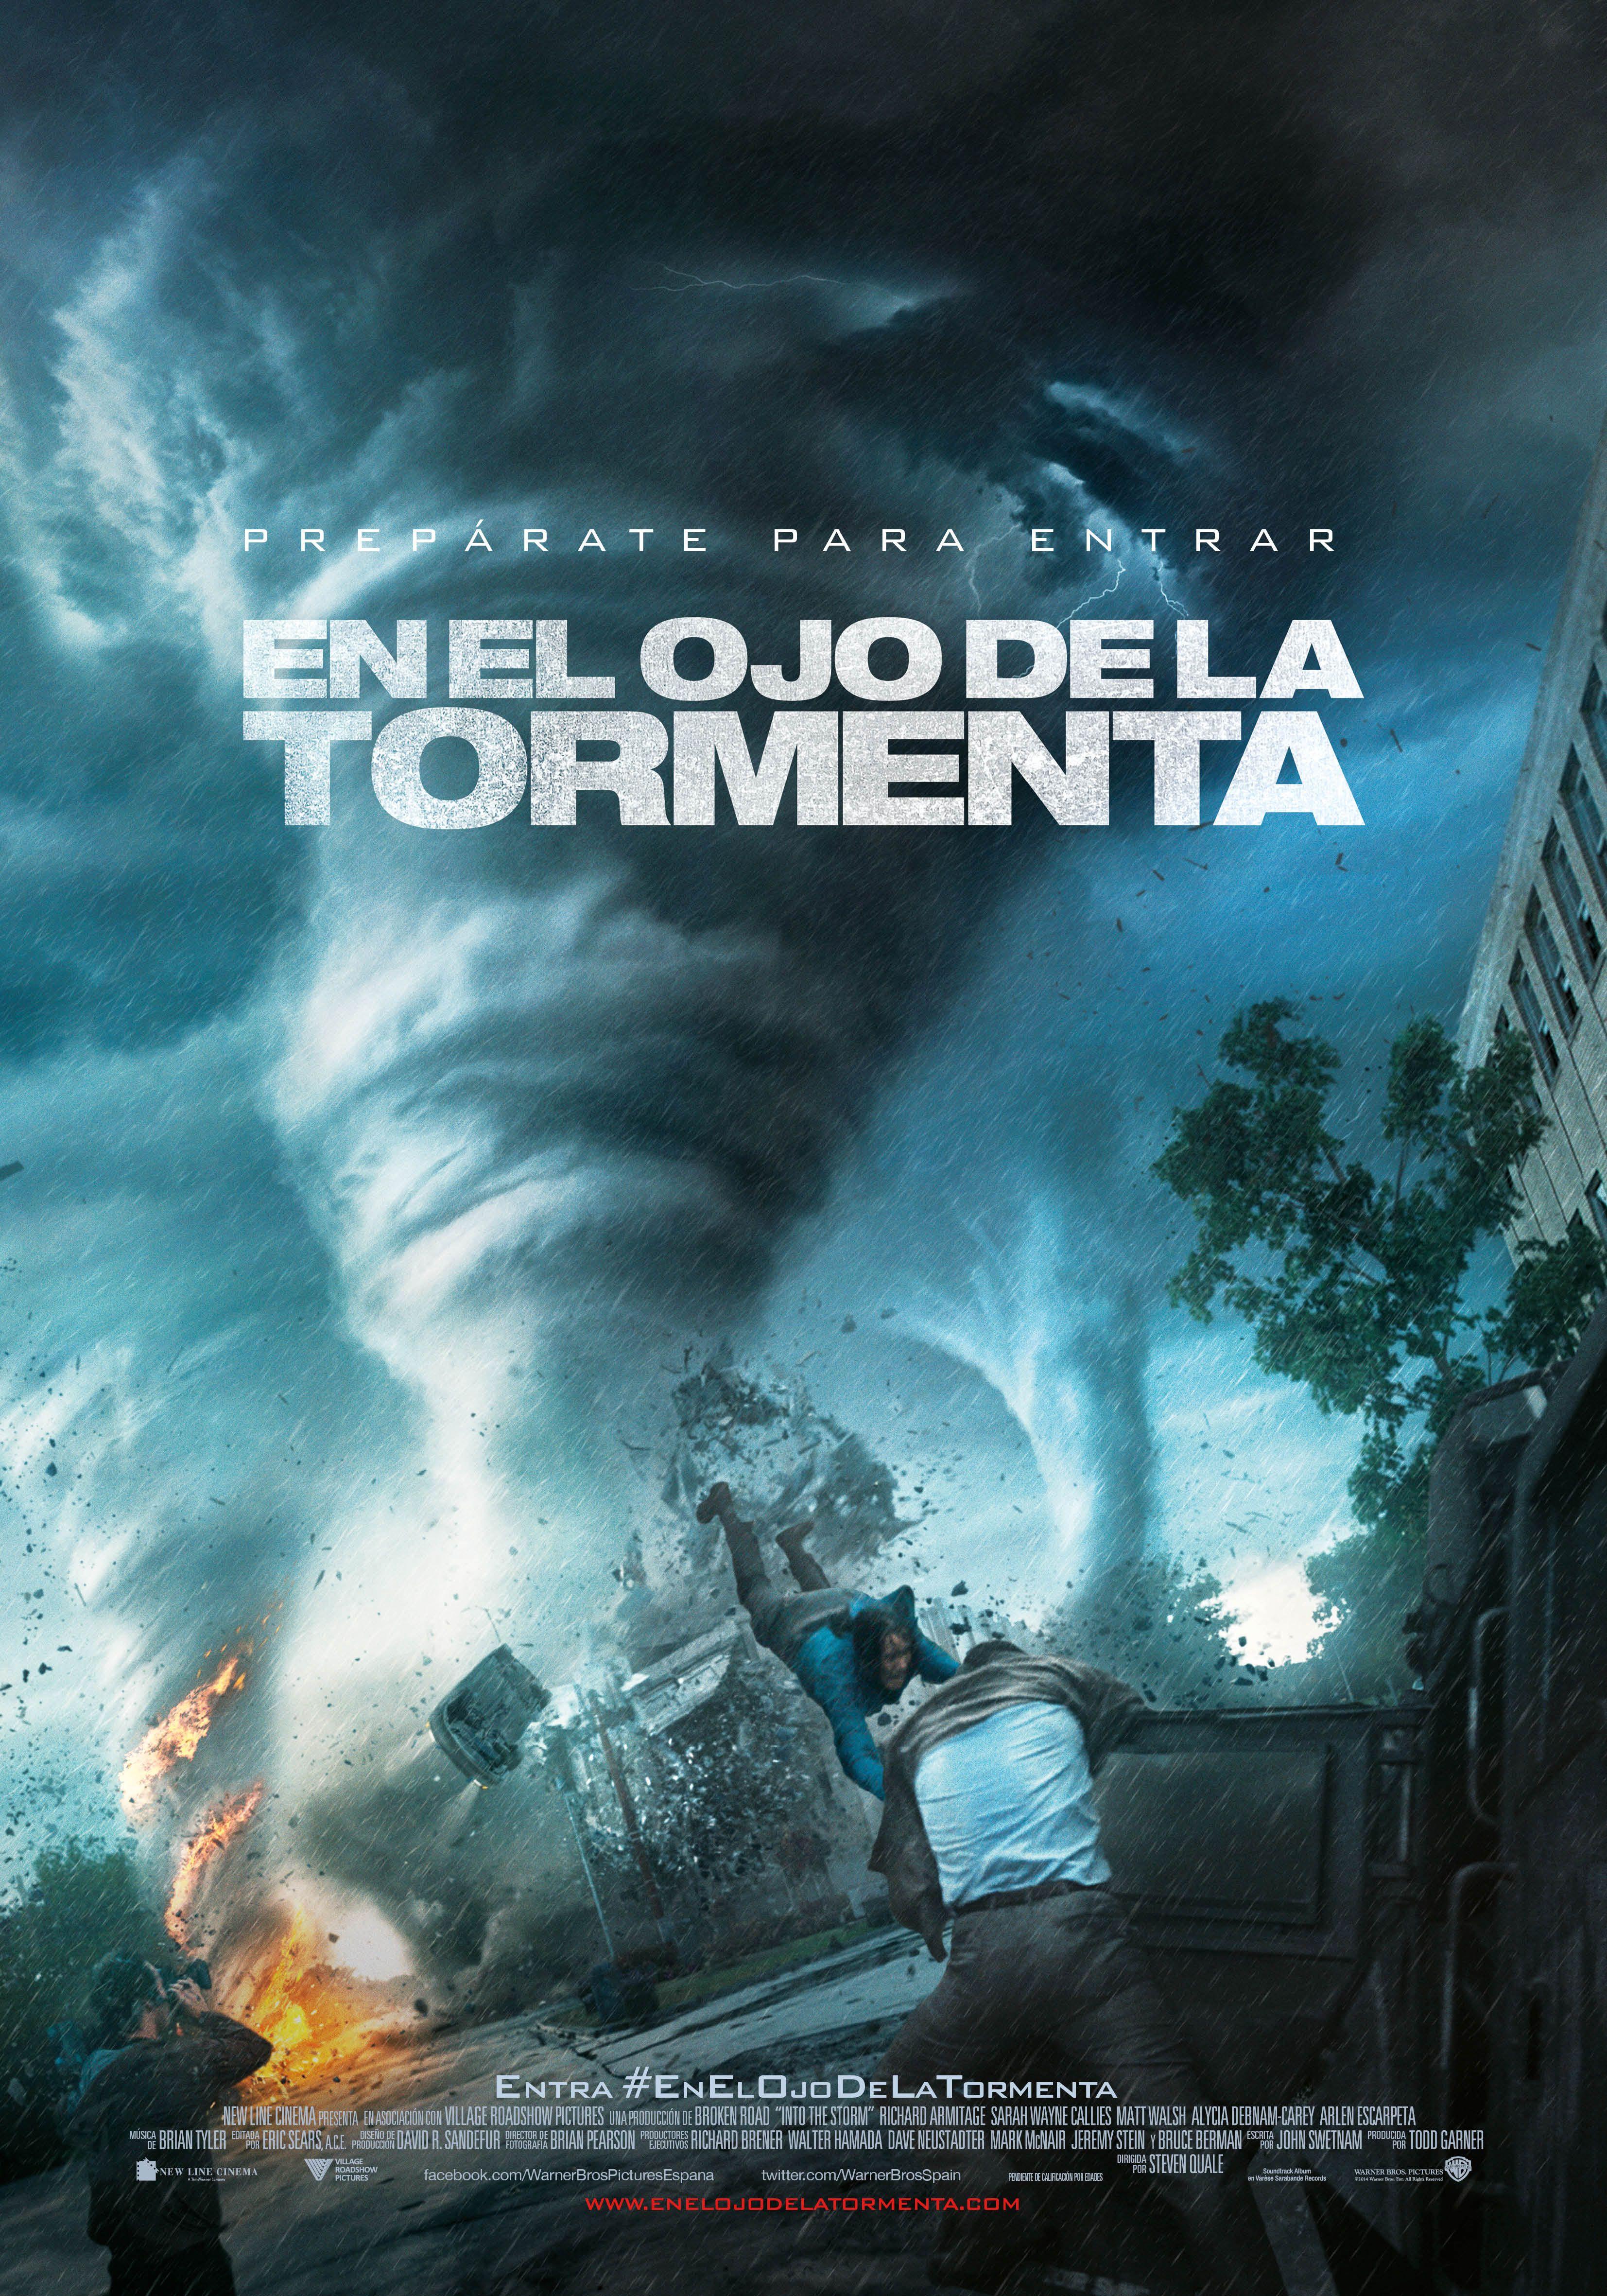 Poster Oficial Para Espana De Enelojodelatormenta Storm Movie Free Movies Online Full Movies Online Free